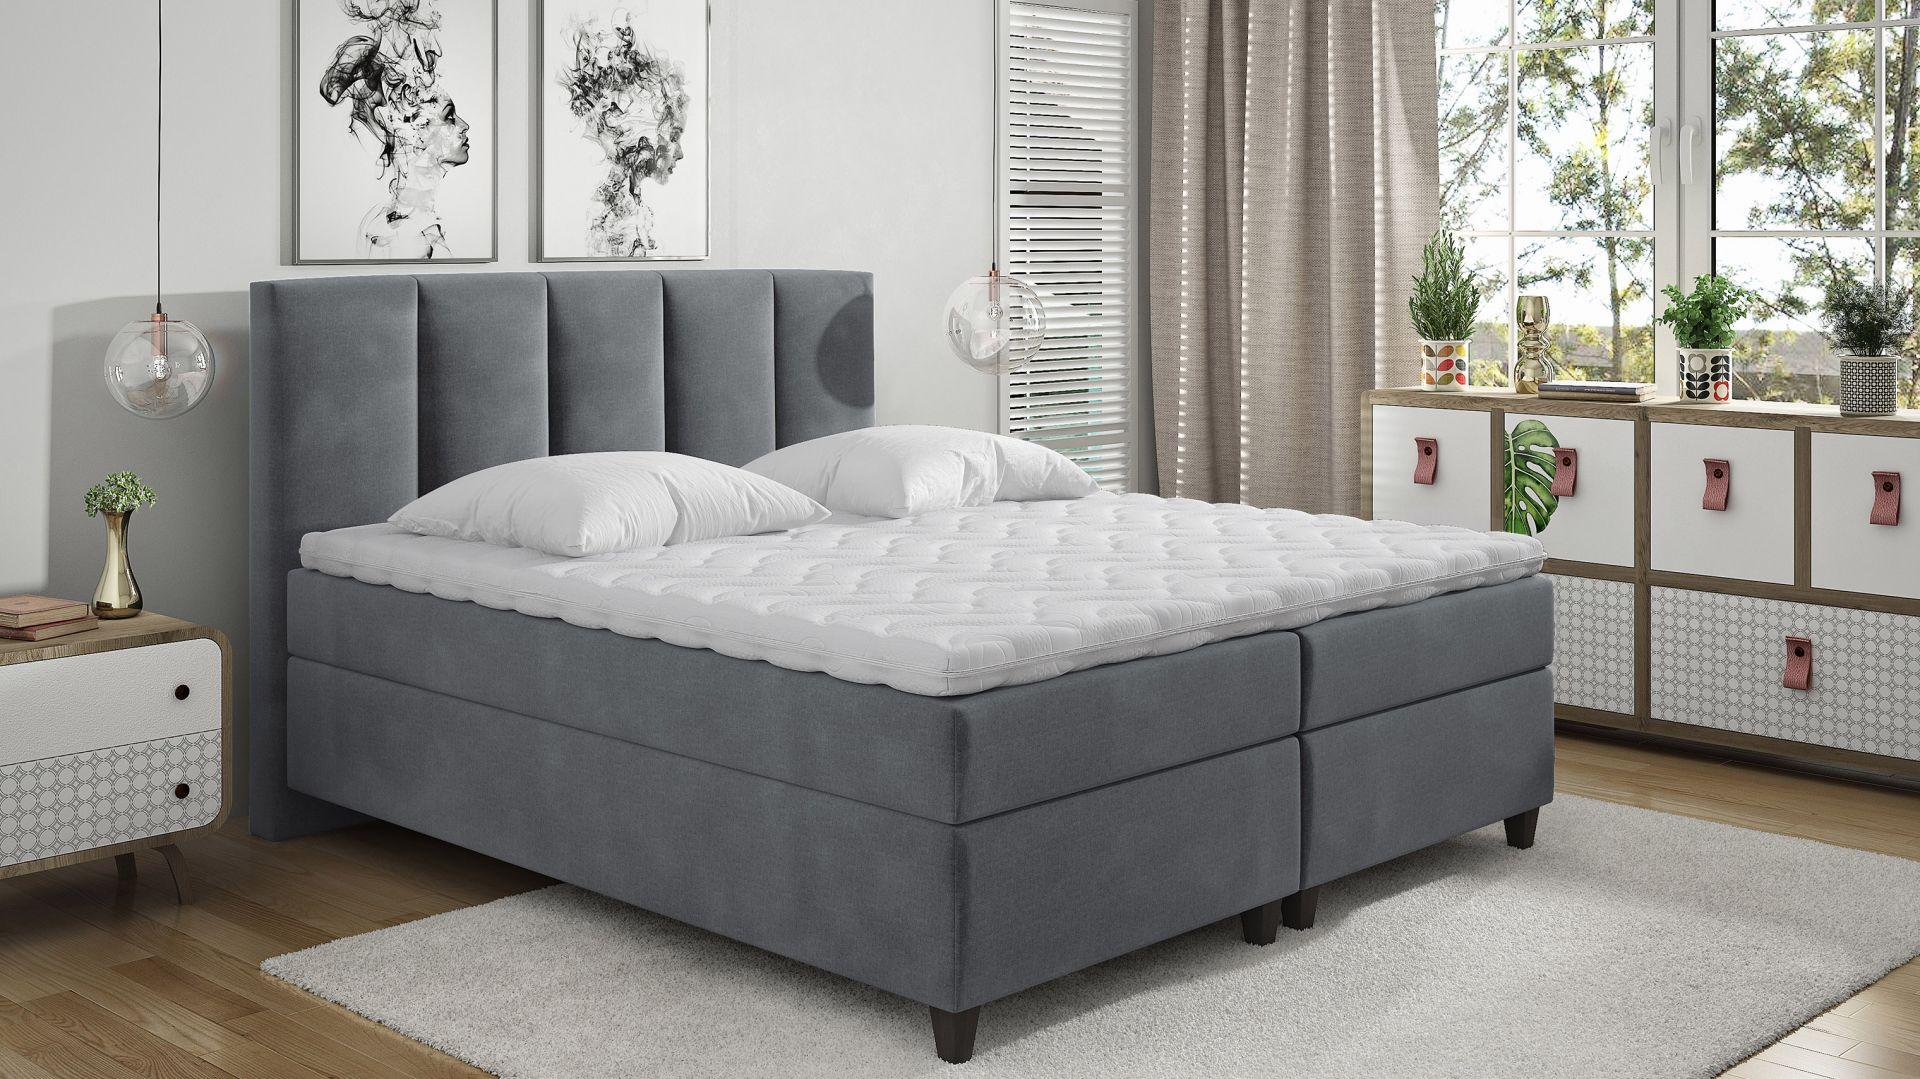 Łóżko kontynentalne Arizona marki Comforteo. Fot. Comforteo